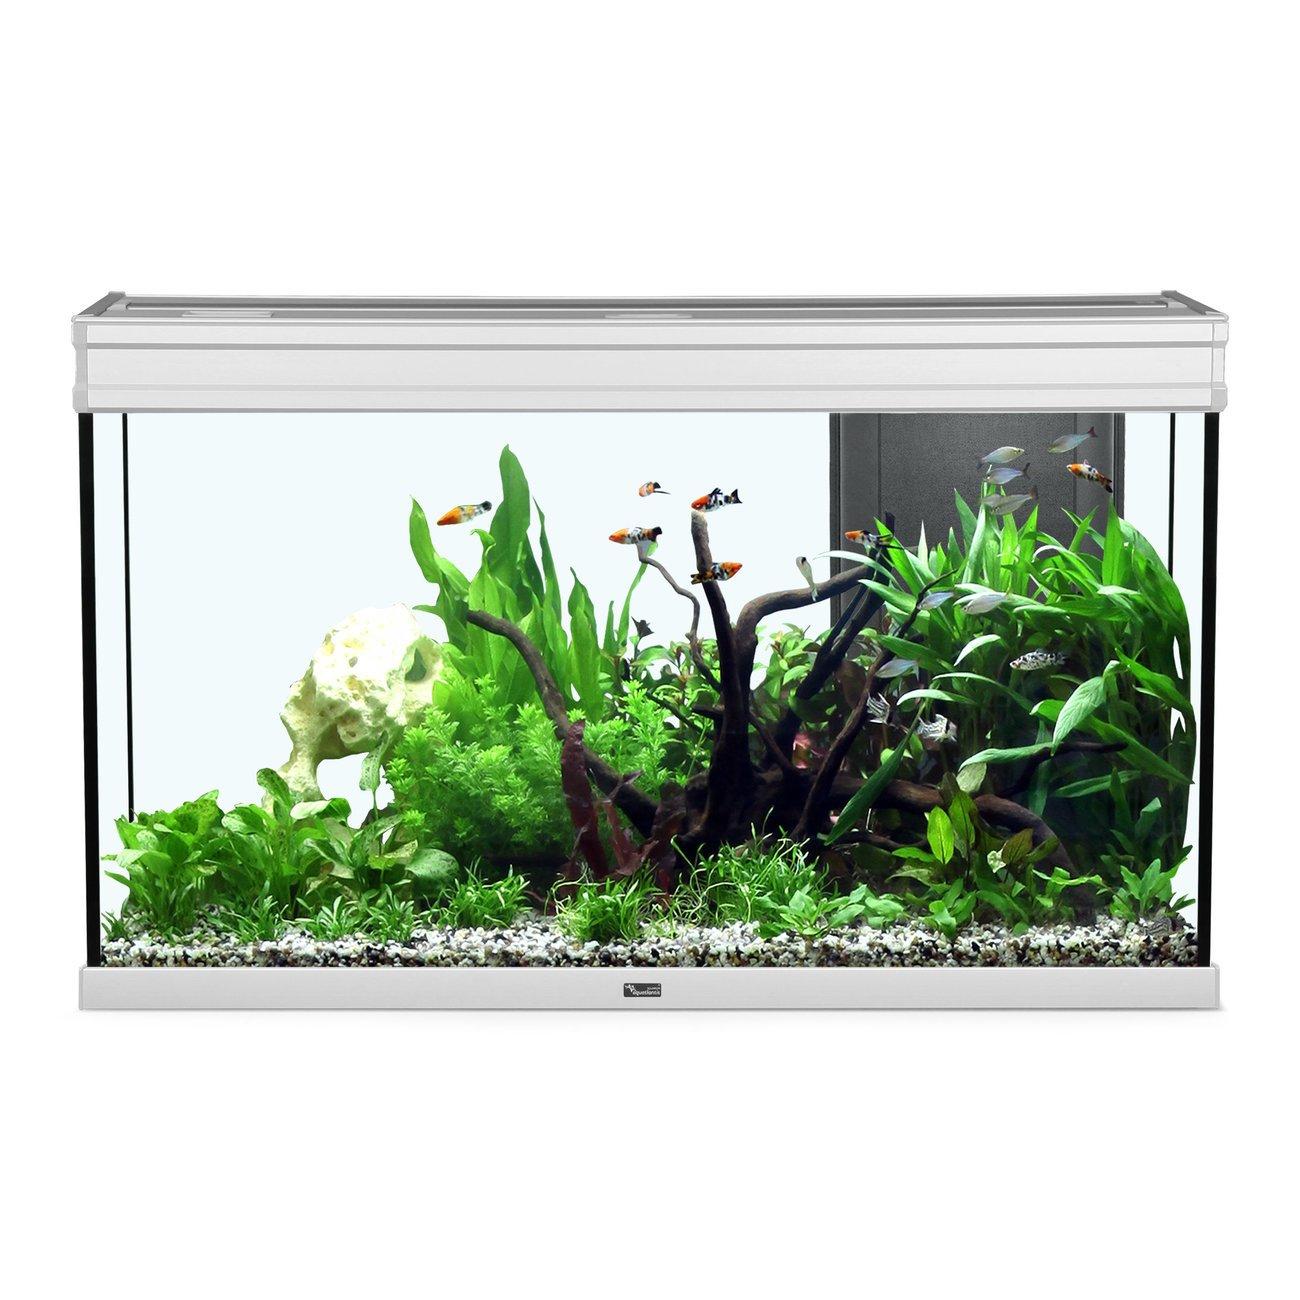 Aquatlantis Elegance Expert 100 Aquarium, Bild 2